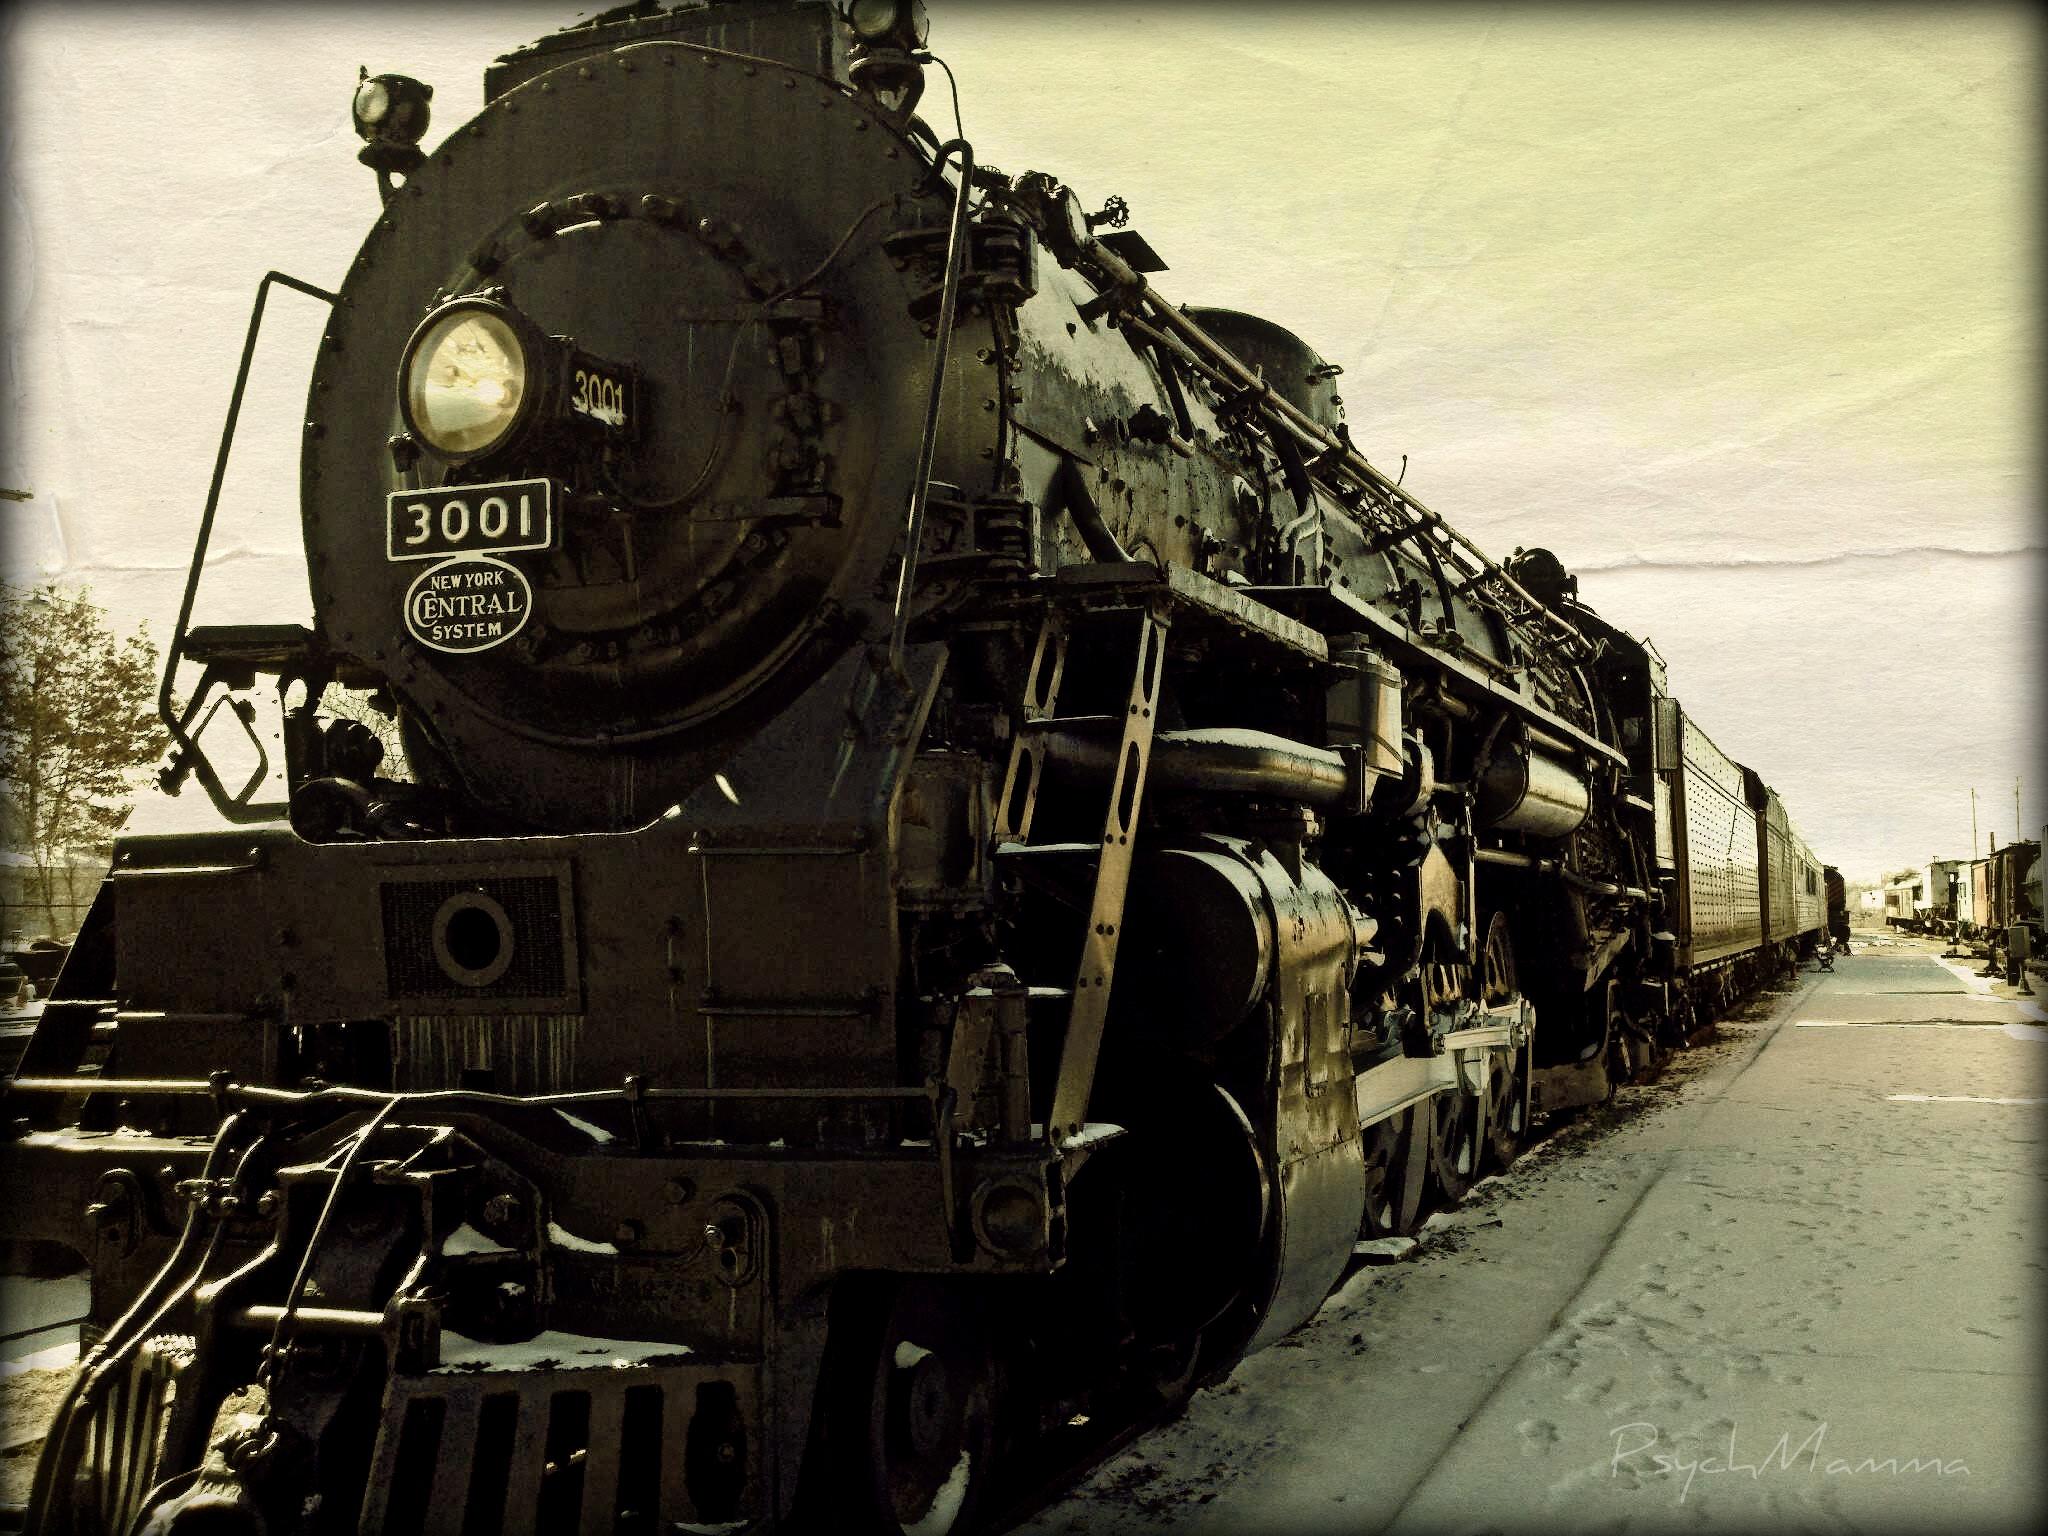 Vintage Train 2048x1536